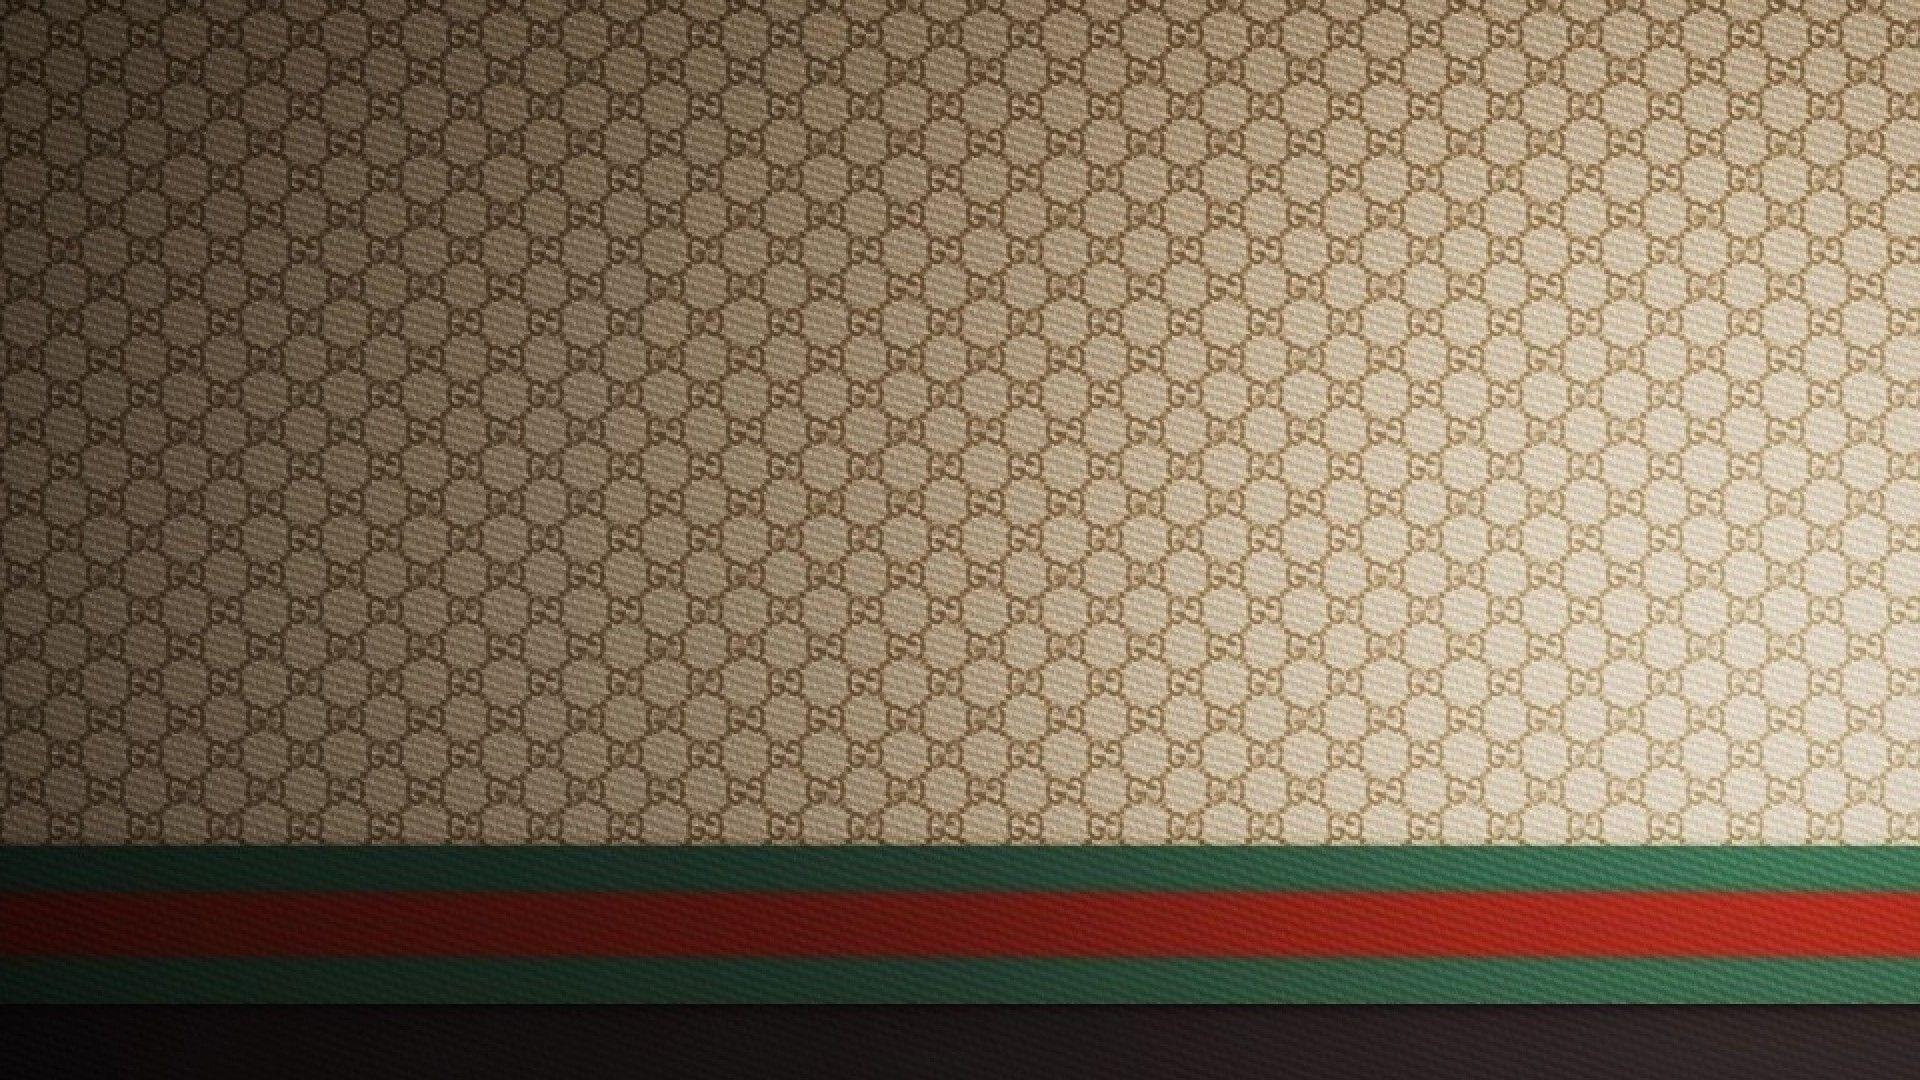 Versace Iphone Wallpaper 63 Images